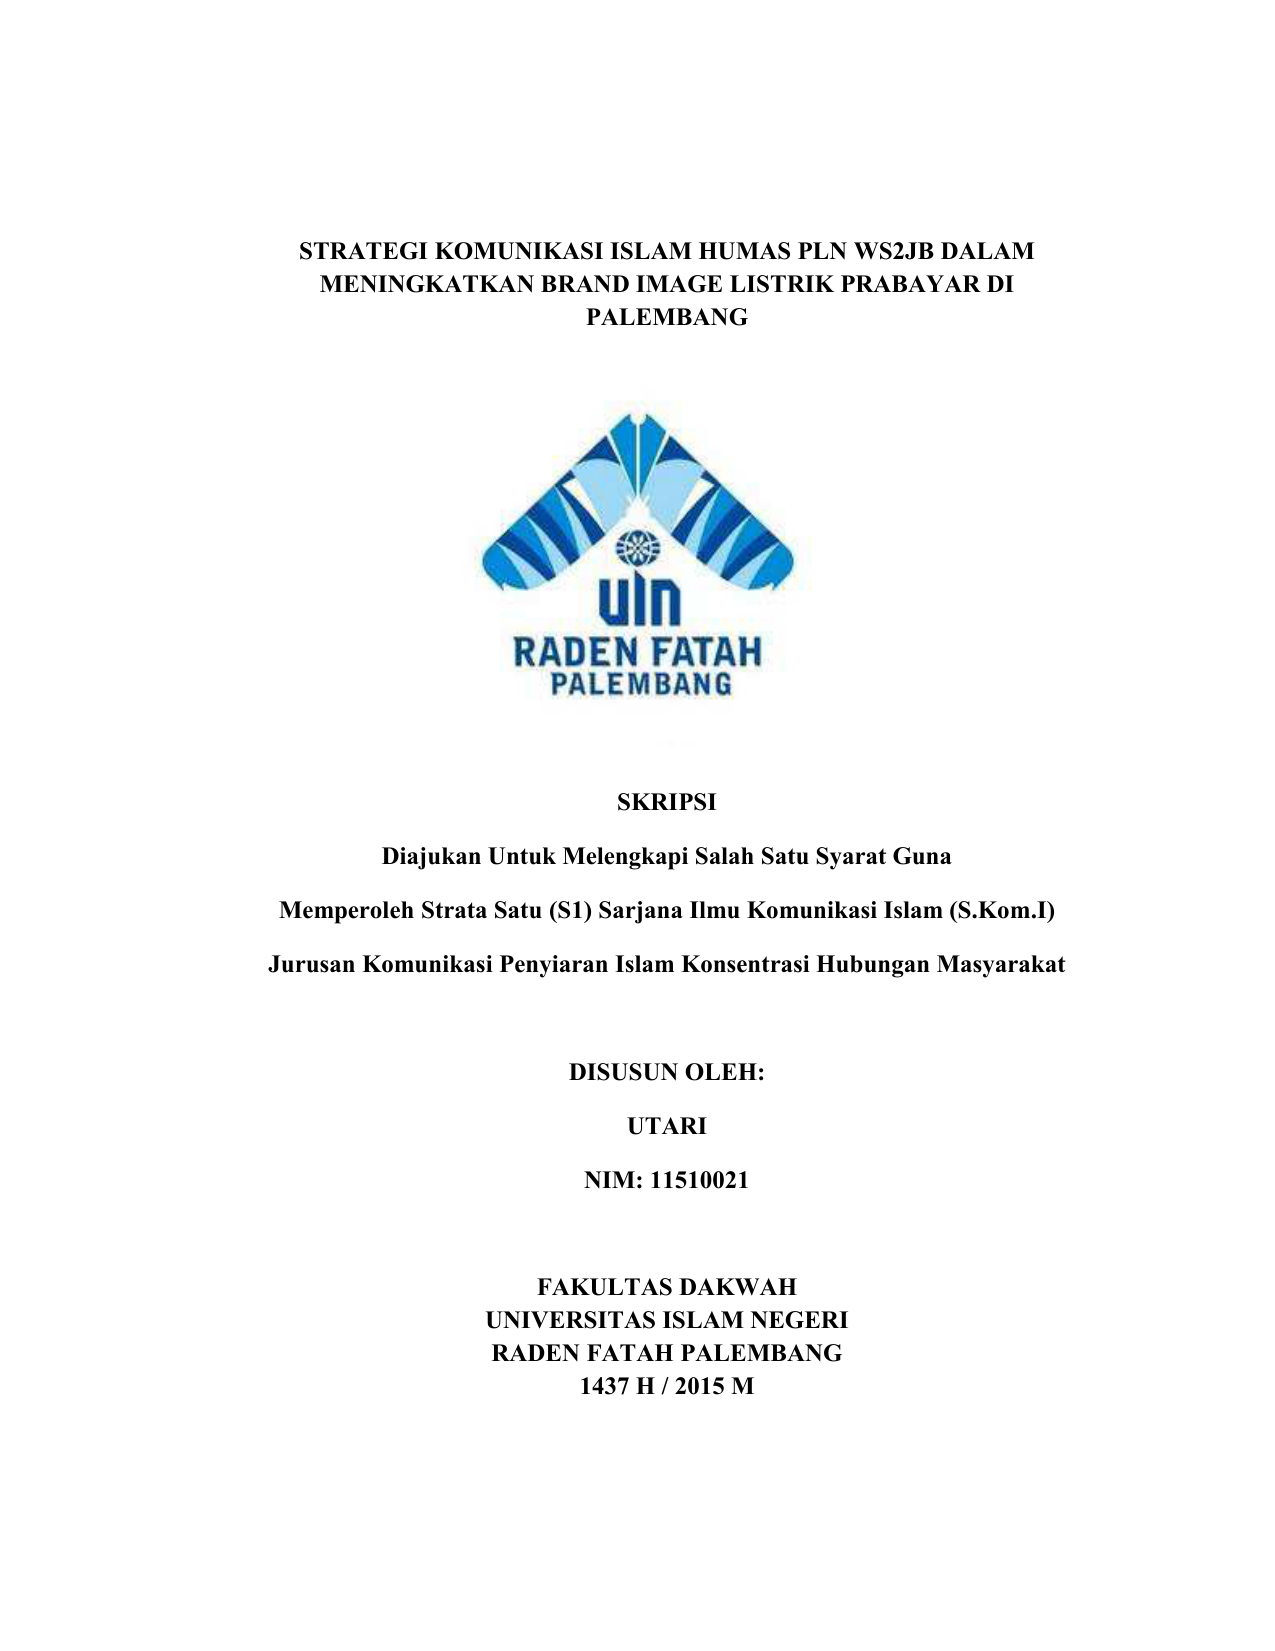 Strategi Komunikasi Islam Humas Pln Ws2jb Dalam